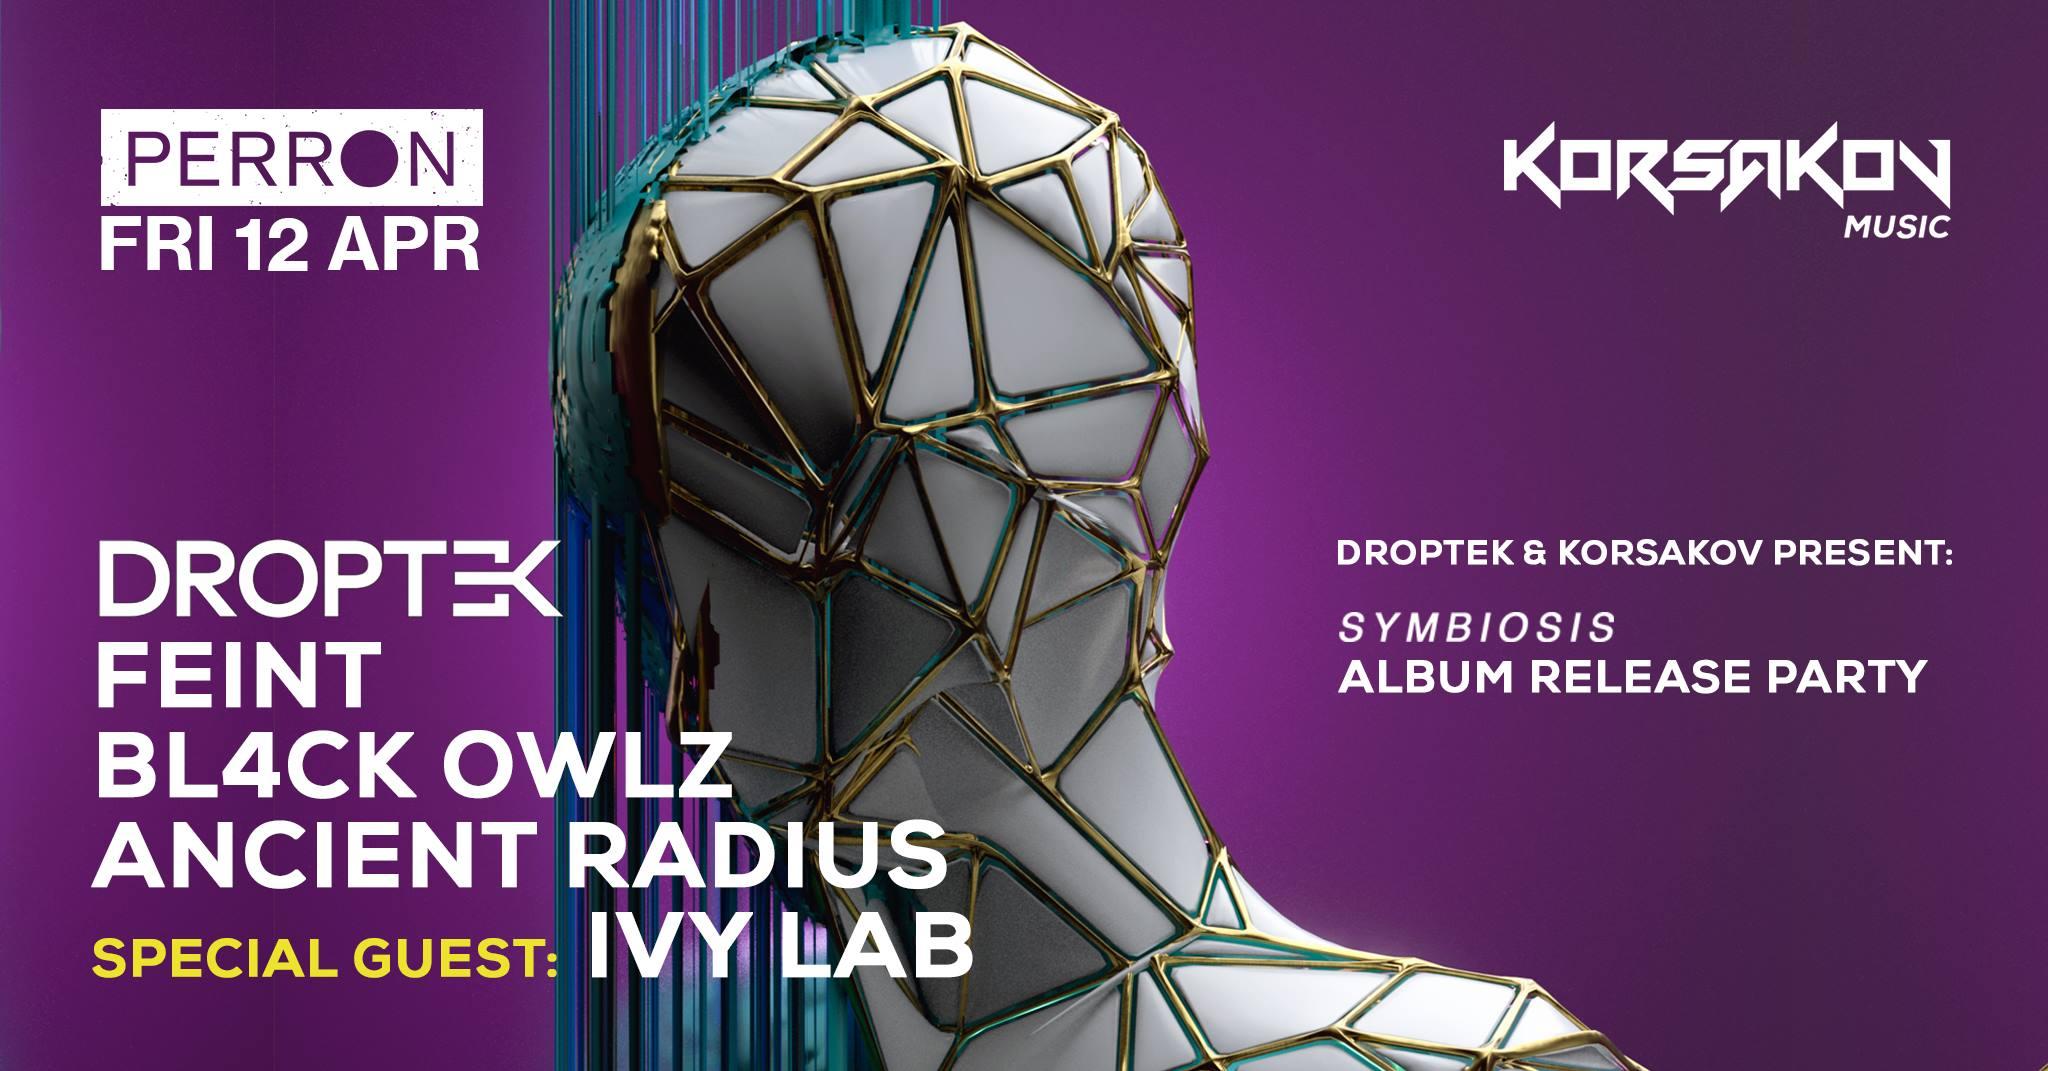 Korsakov Presents: Droptek Album Release Party